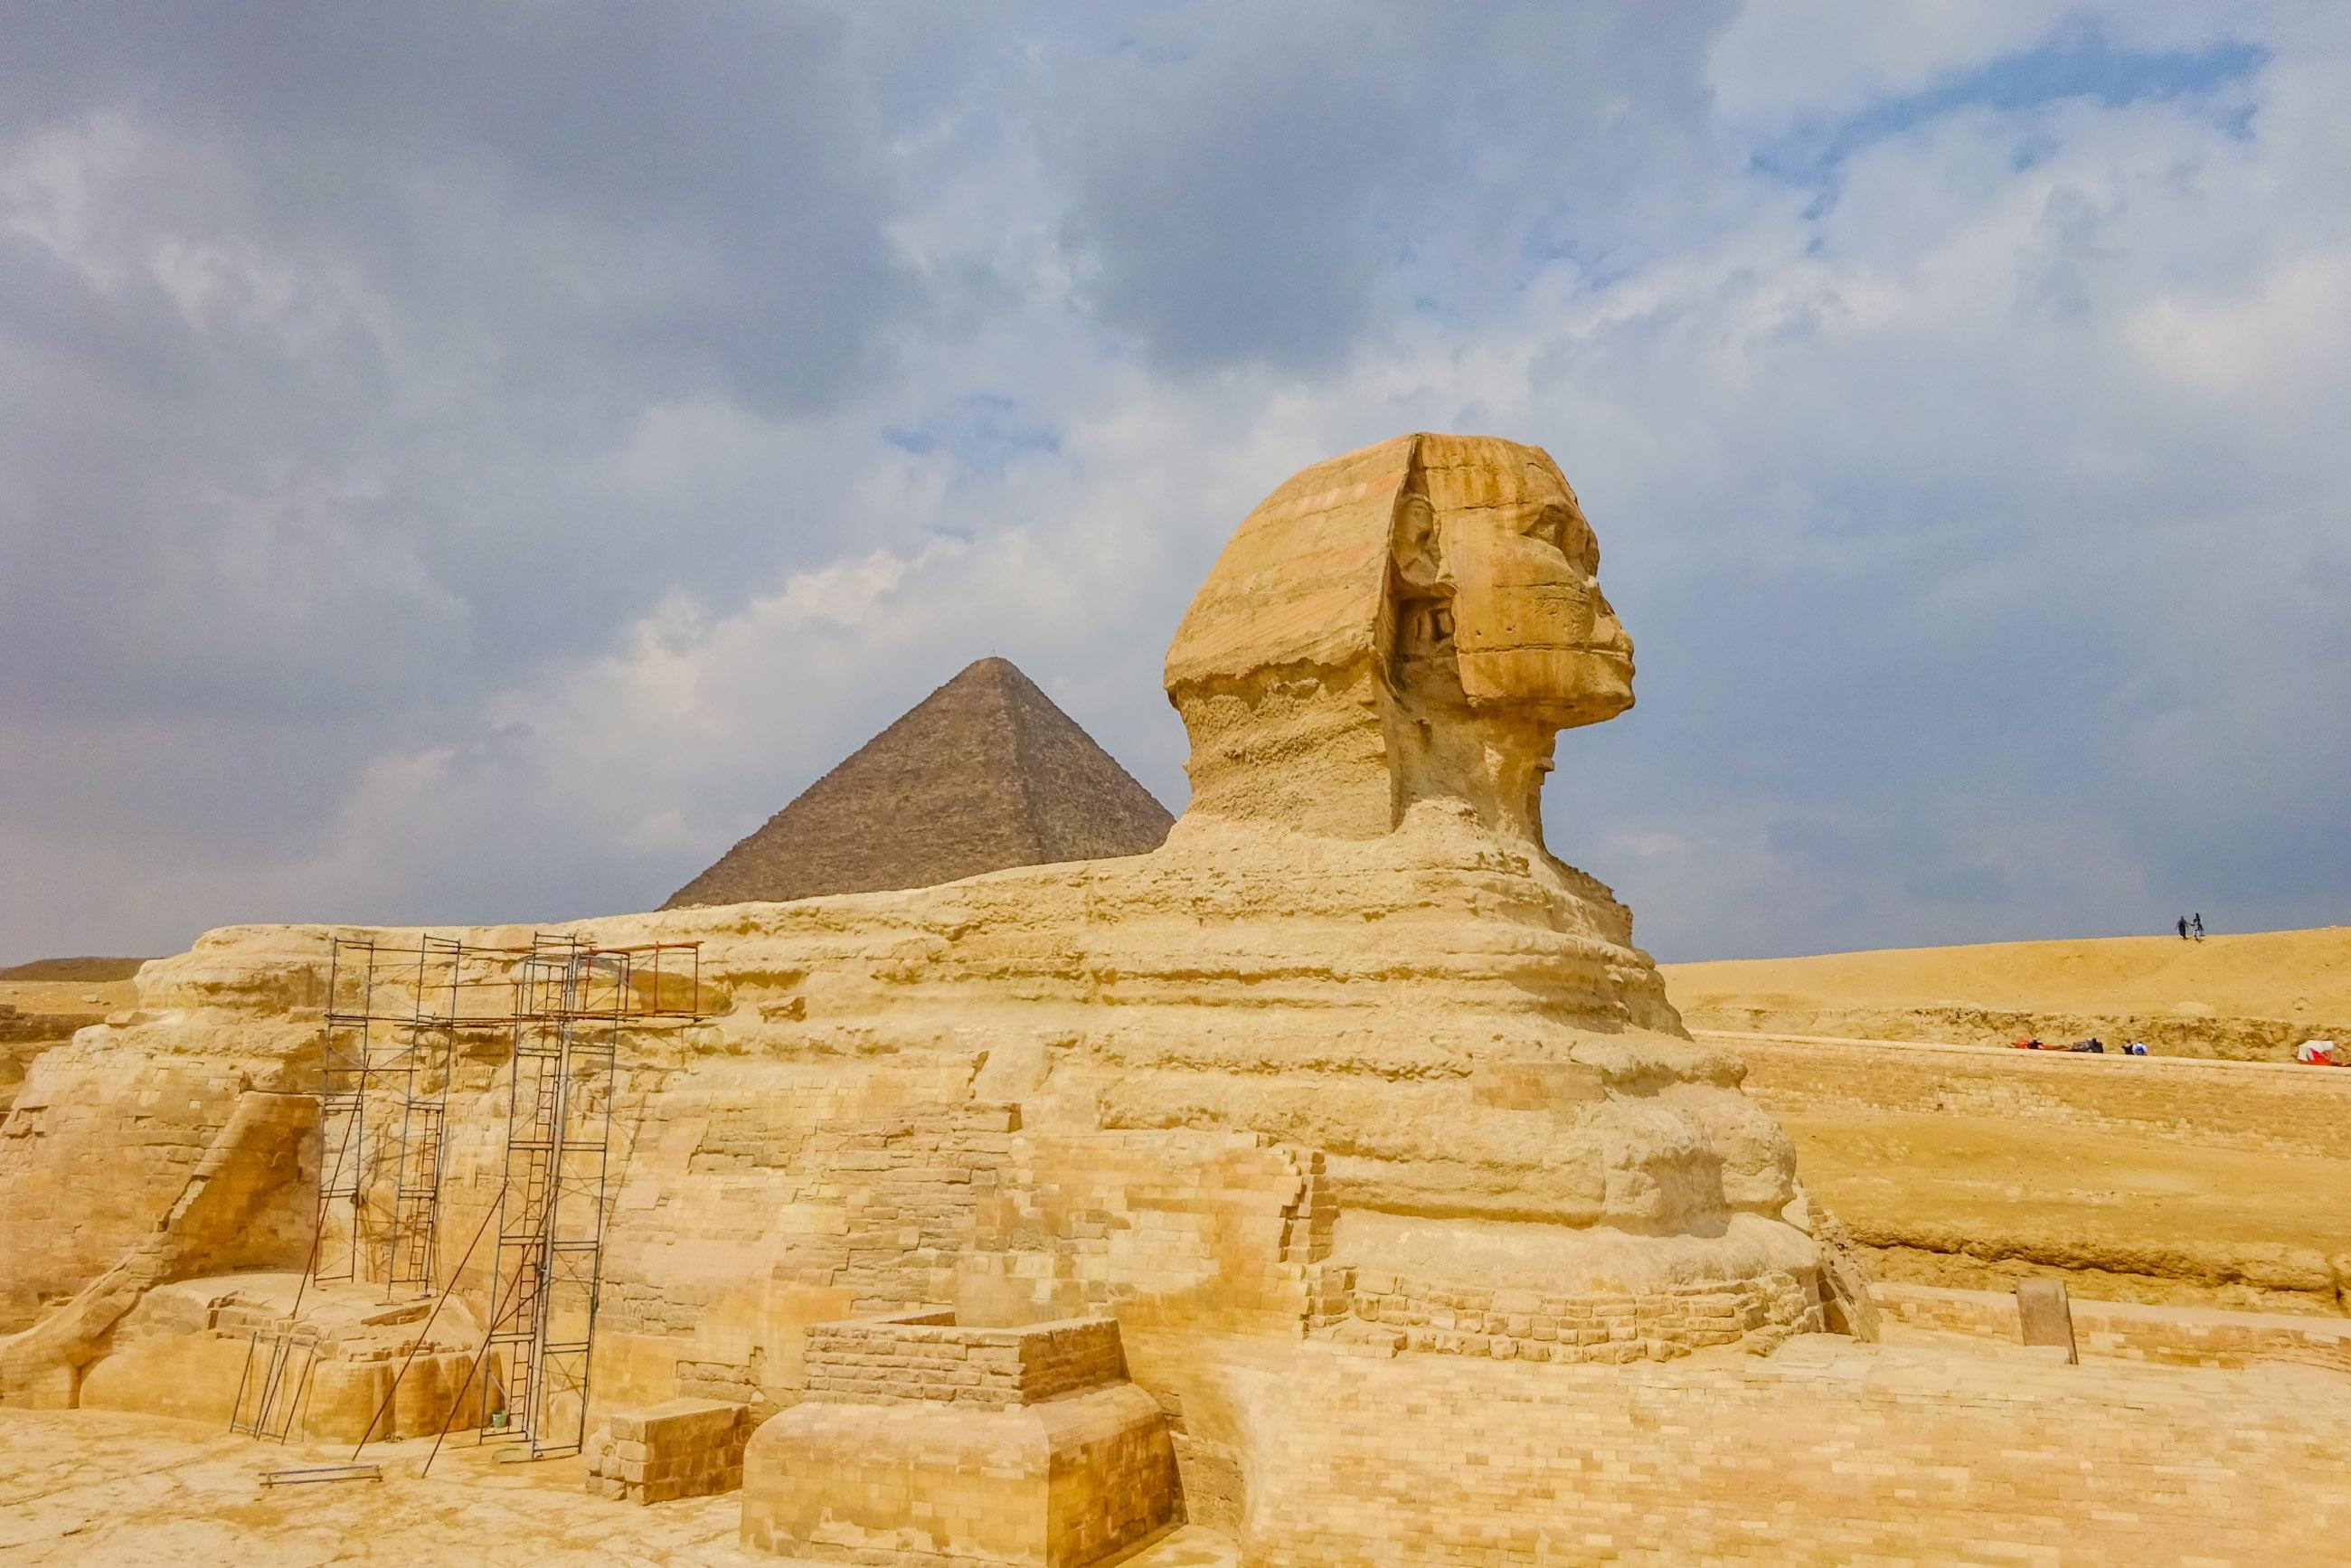 https://bubo.sk/uploads/galleries/17820/miroslavadlha_egypt_kahira-58-.jpg